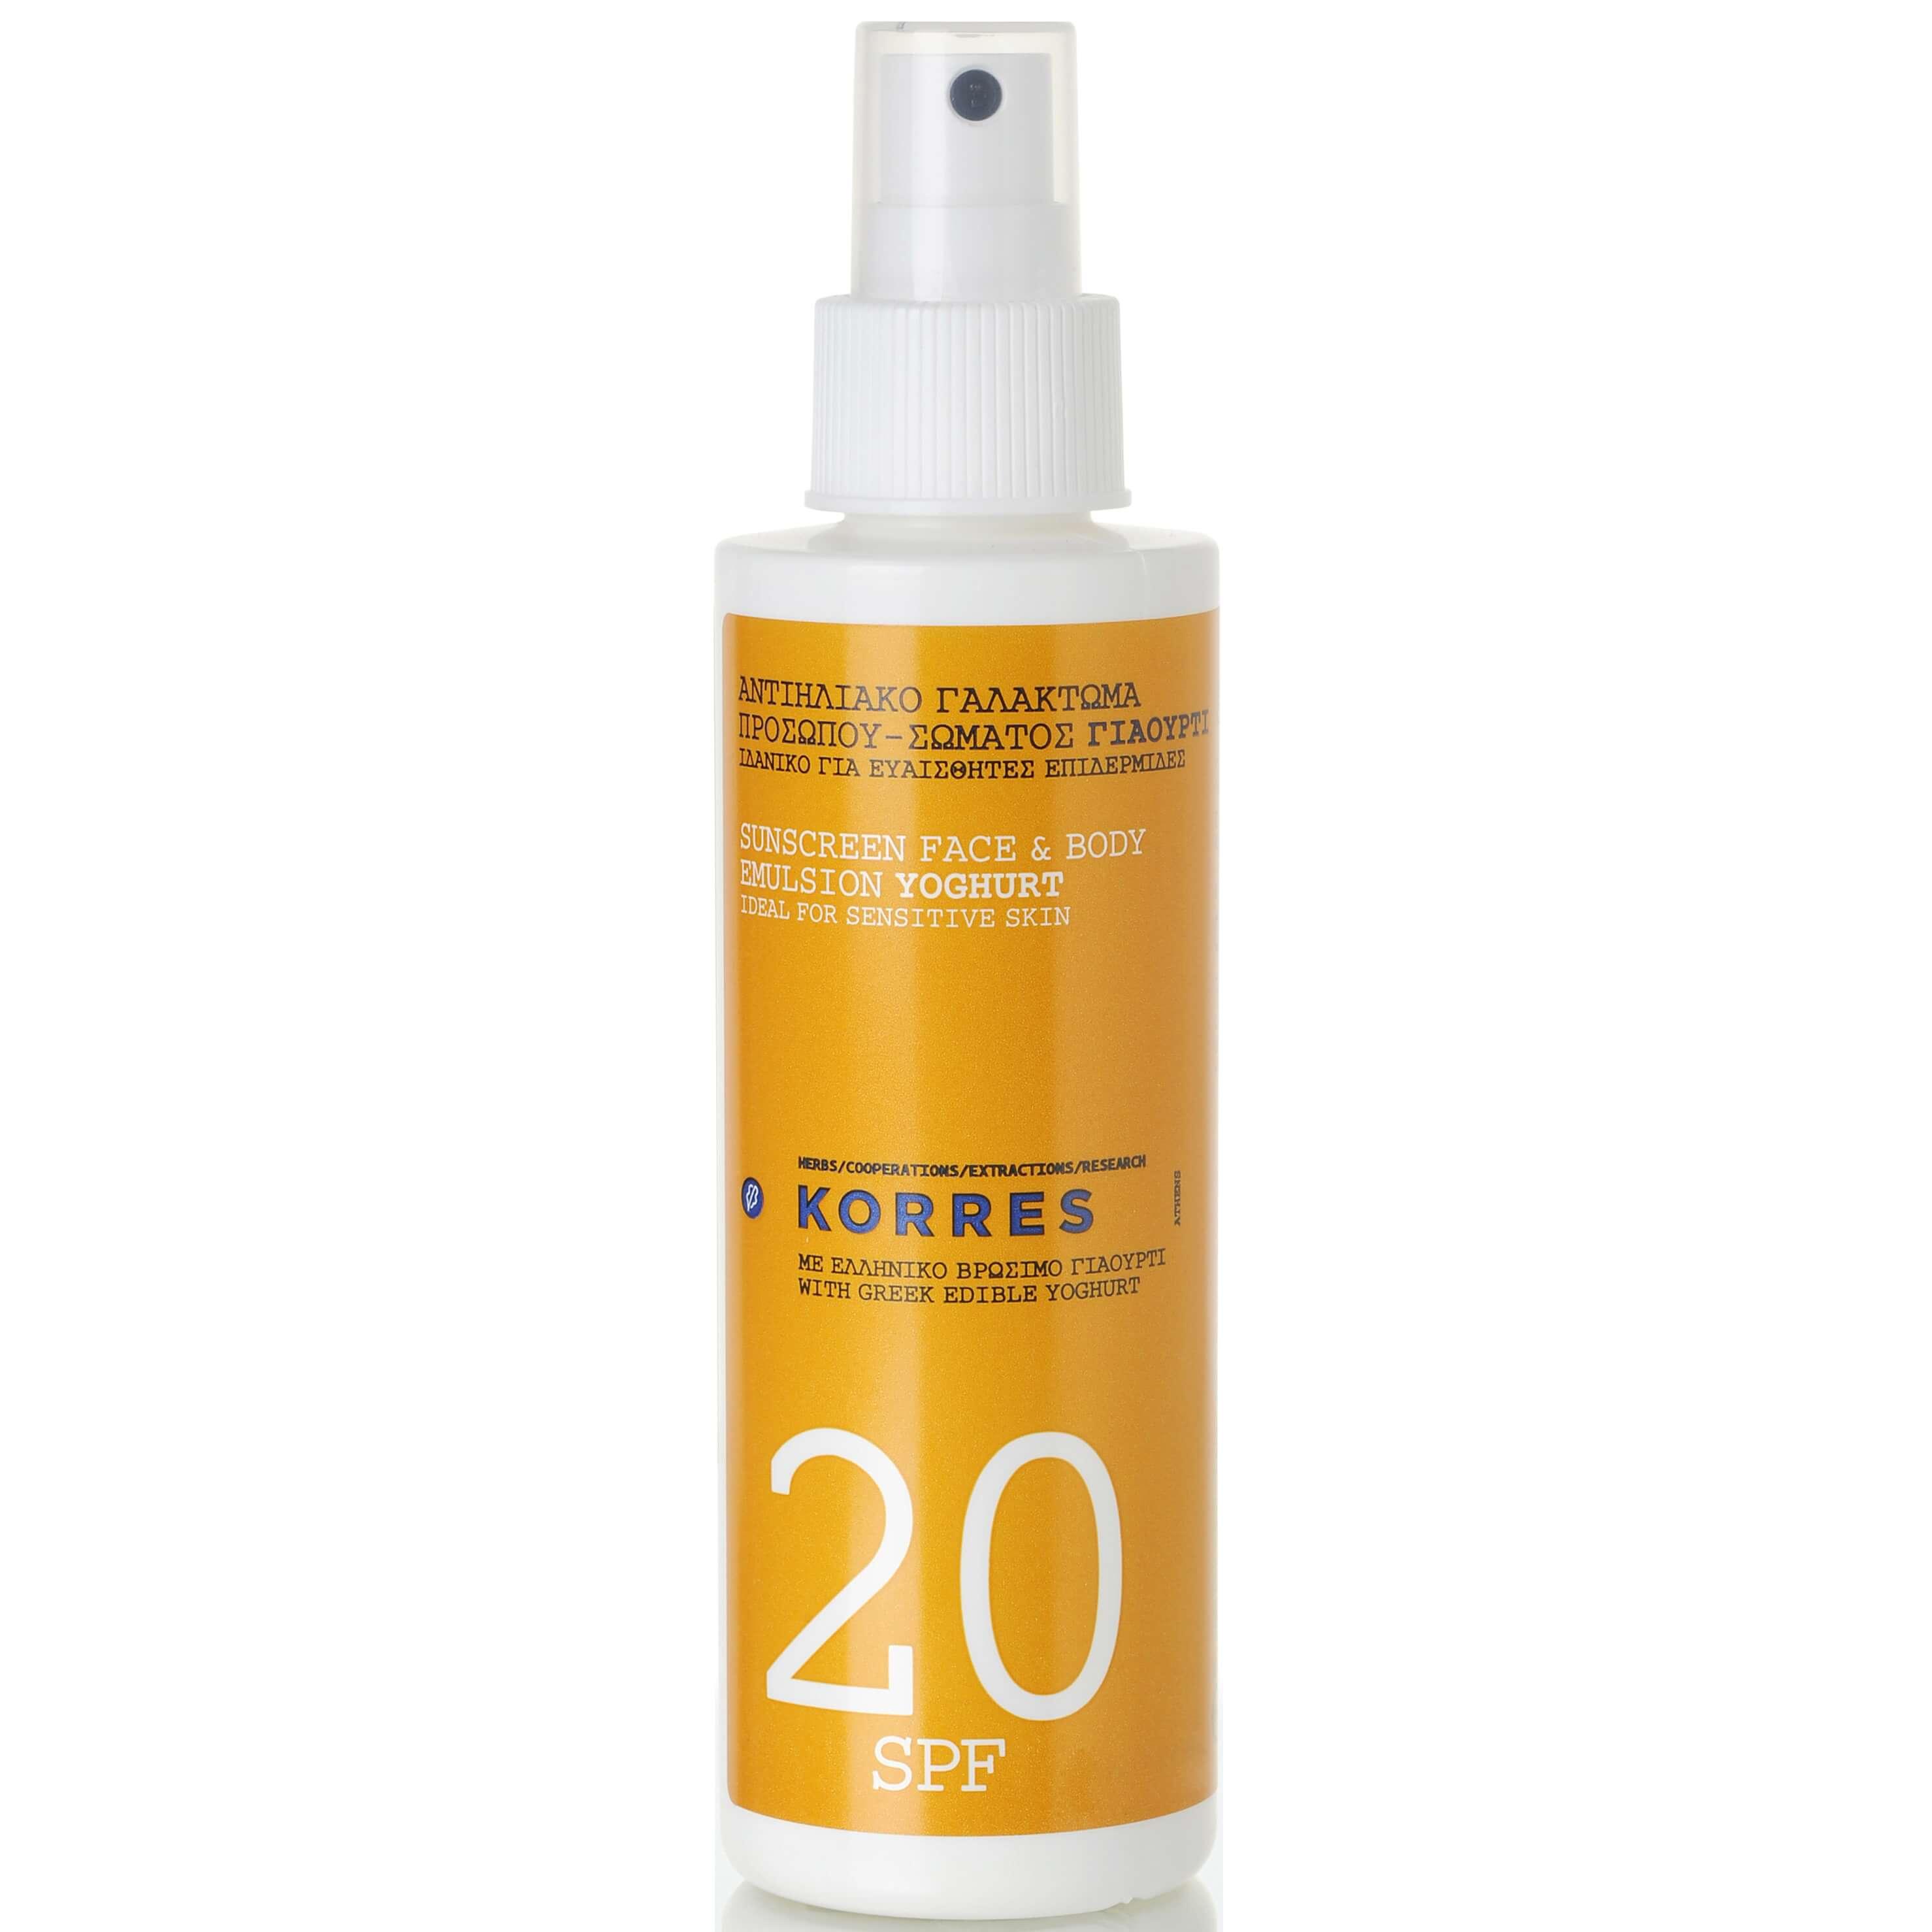 Korres Αντηλιακό Γαλάκτωμα Spray Προσώπου-Σώματος Γιαούρτι Spf20 150ml